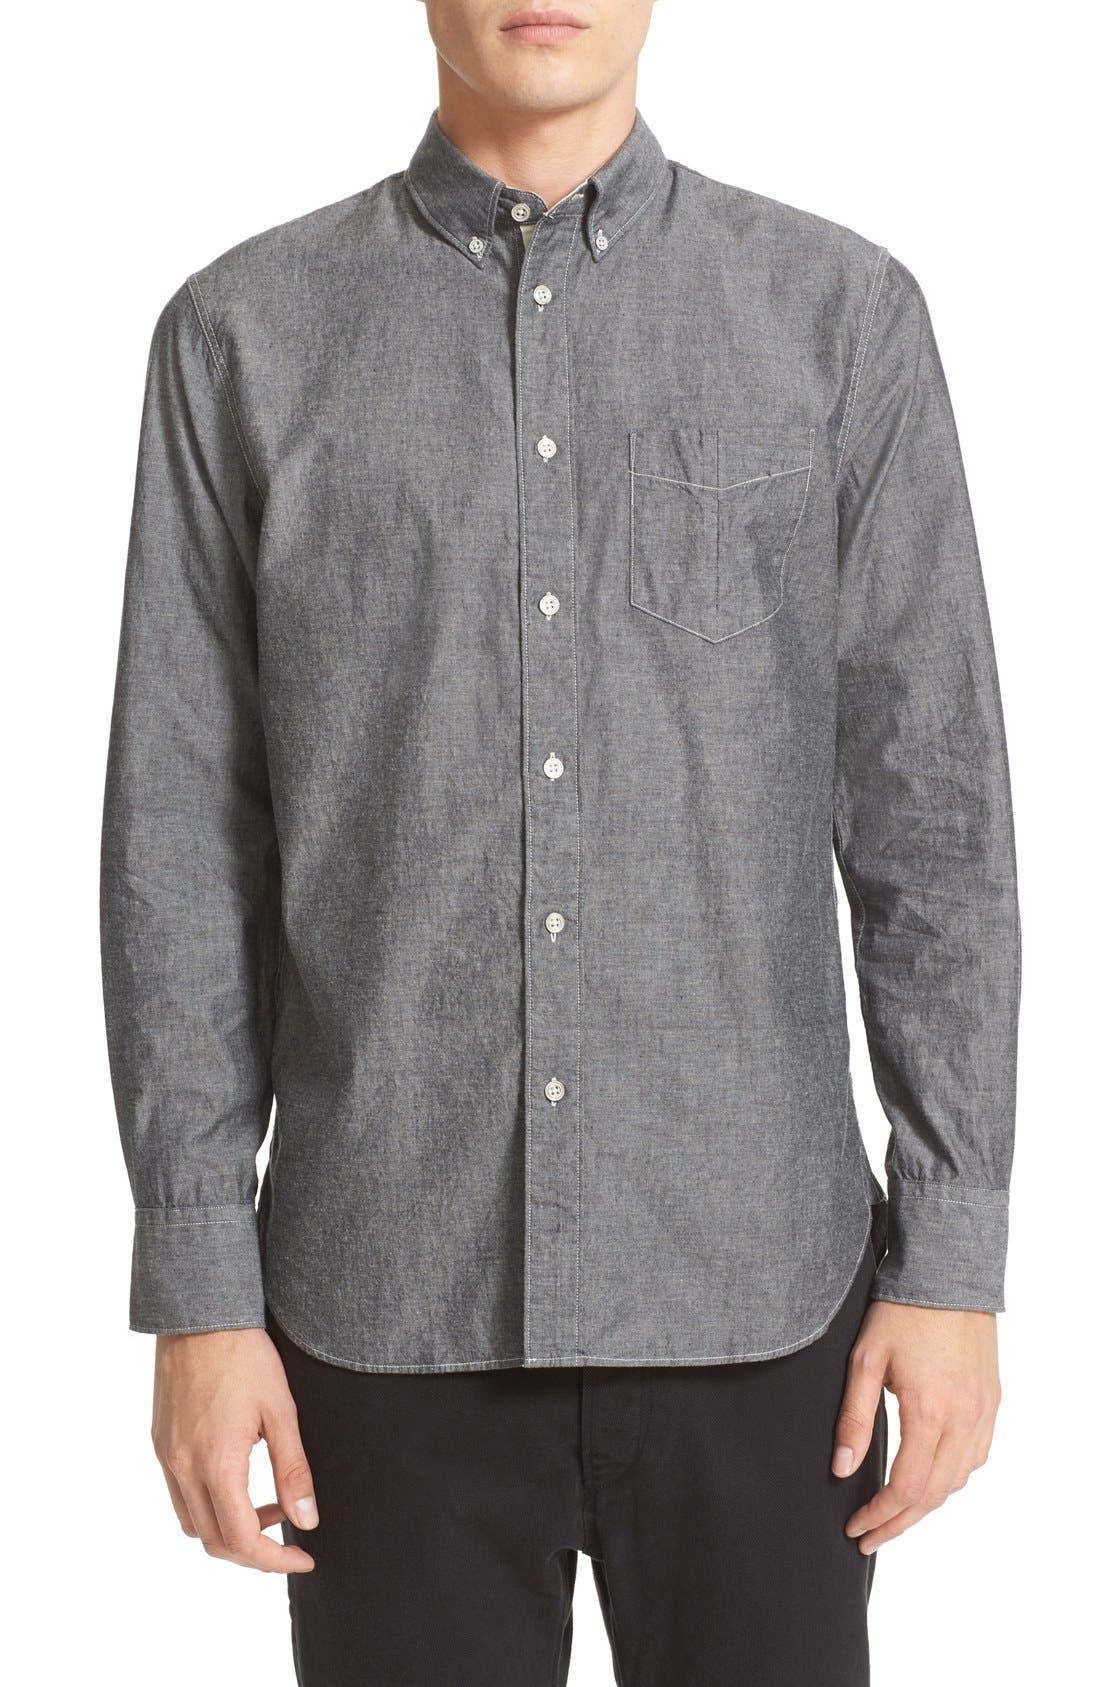 Alternate Image 1 Selected - rag & bone Trim Fit Chambray Shirt